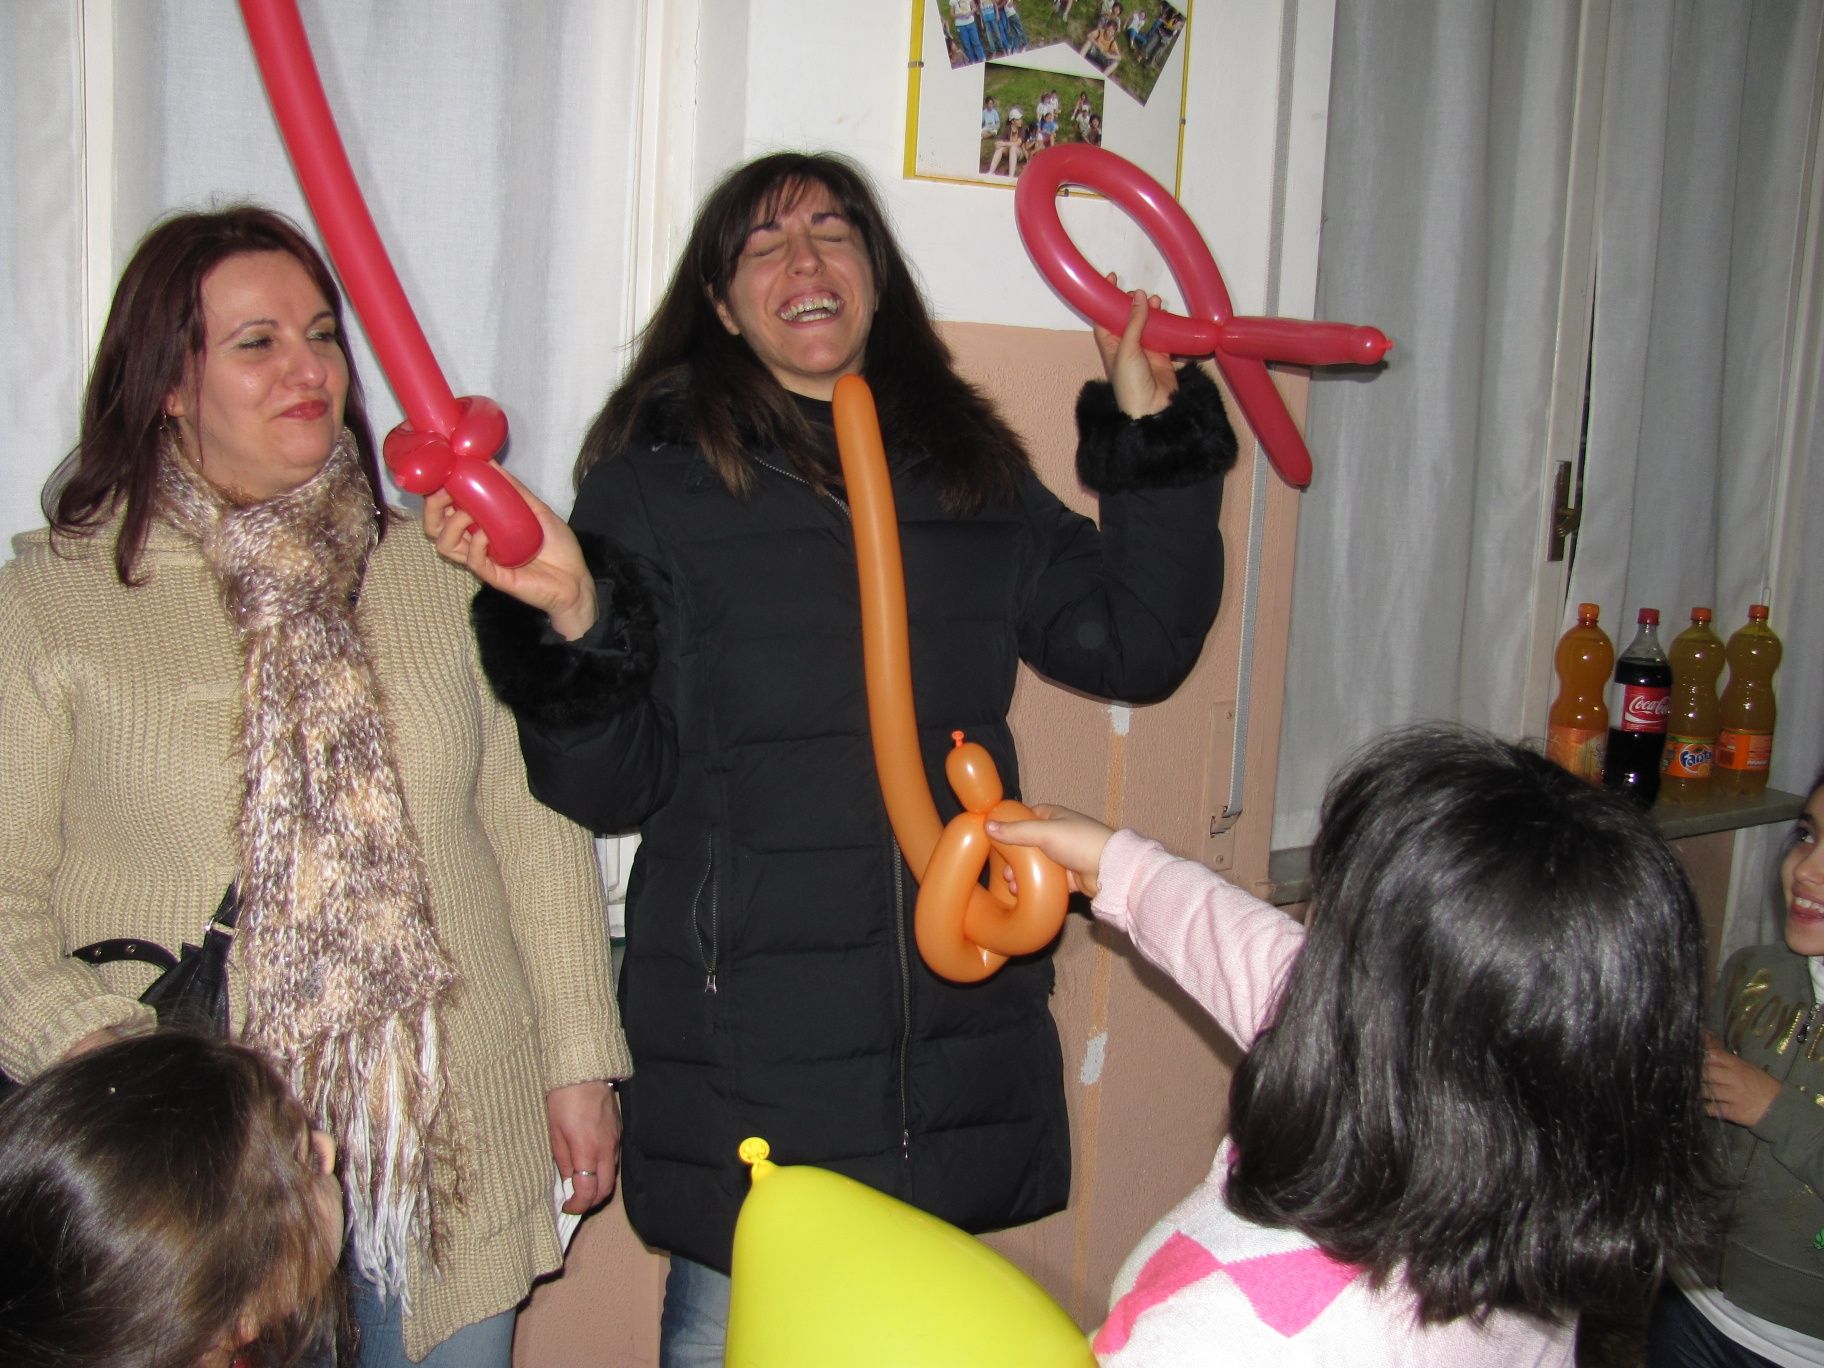 ricordo_battesimo_gesu_2011-01-23-17-06-26